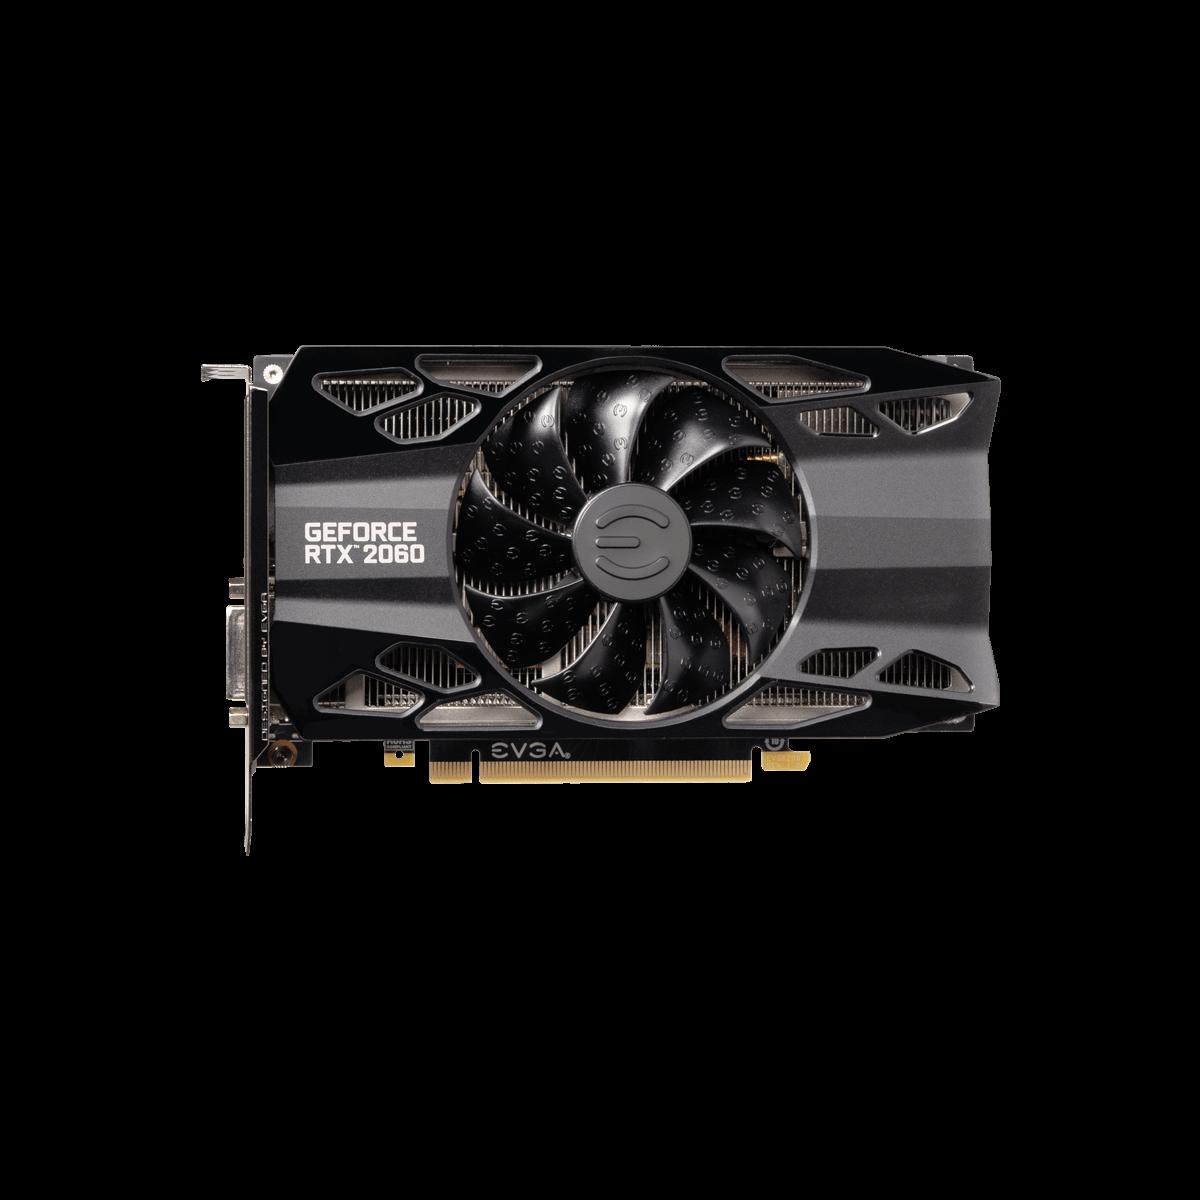 Placa de Vídeo EVGA GeForce RTX 2060 XC 6GB GDDR6 192bit 06G-P4-2063-KR